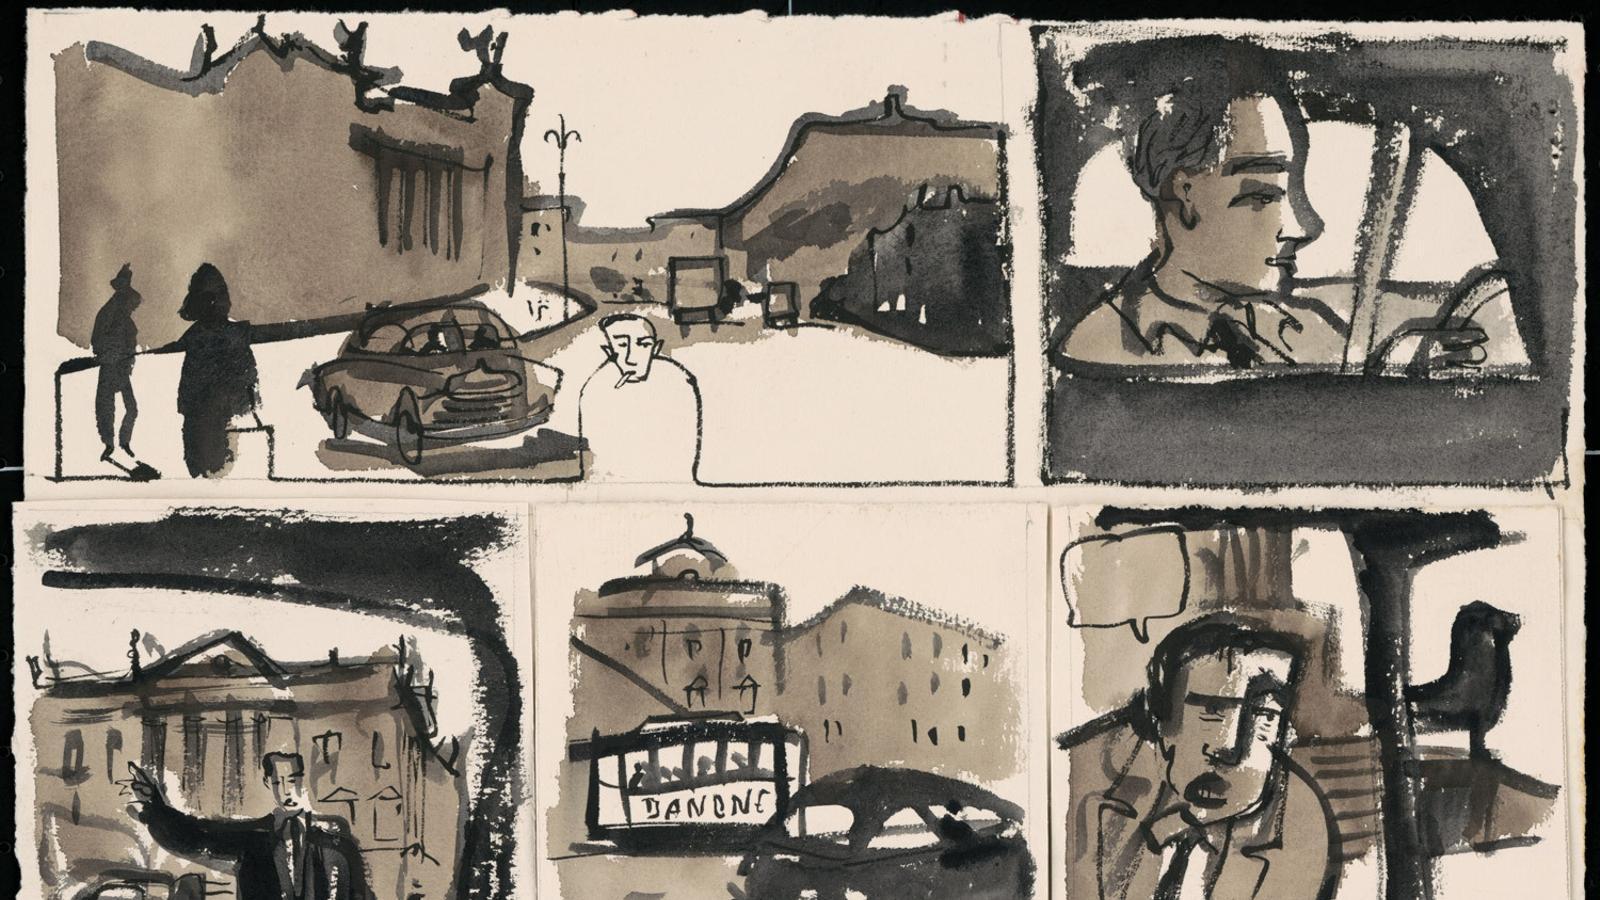 Javier Montesol a Gràfica Radiant: 'Crim no resolt a la Via Laietana'